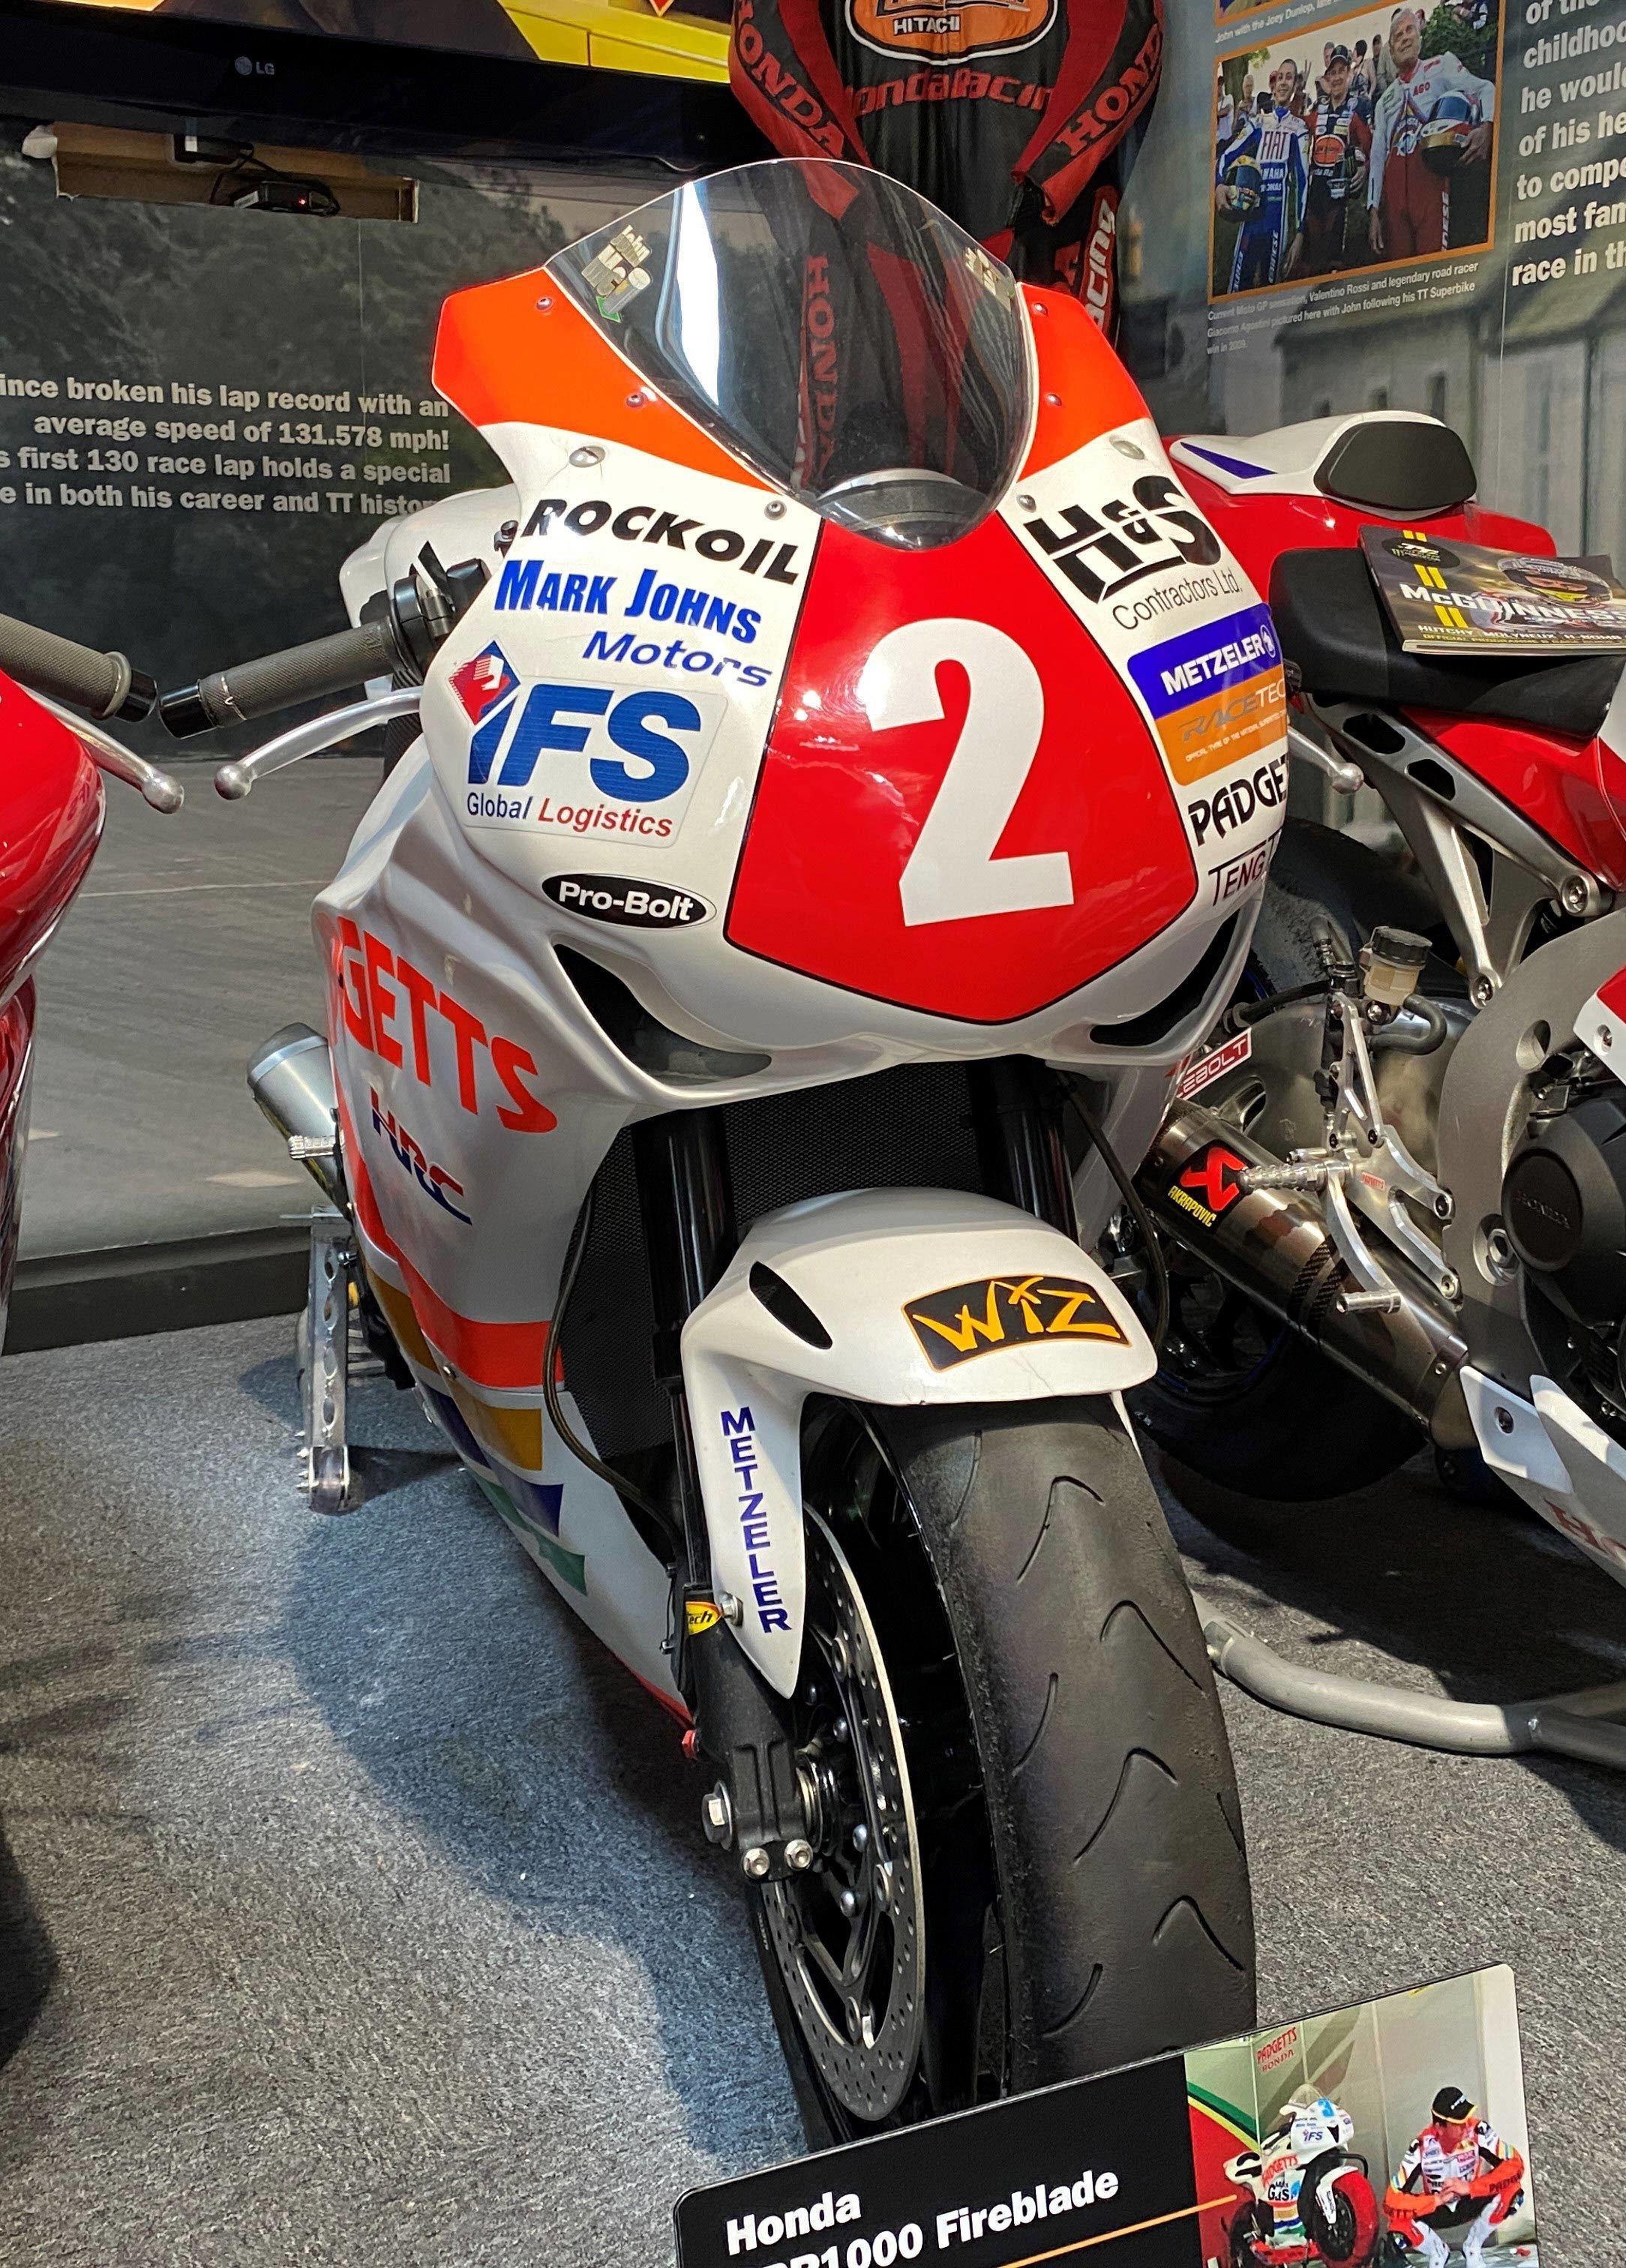 BIKE: Honda CBR1000 Fireblade